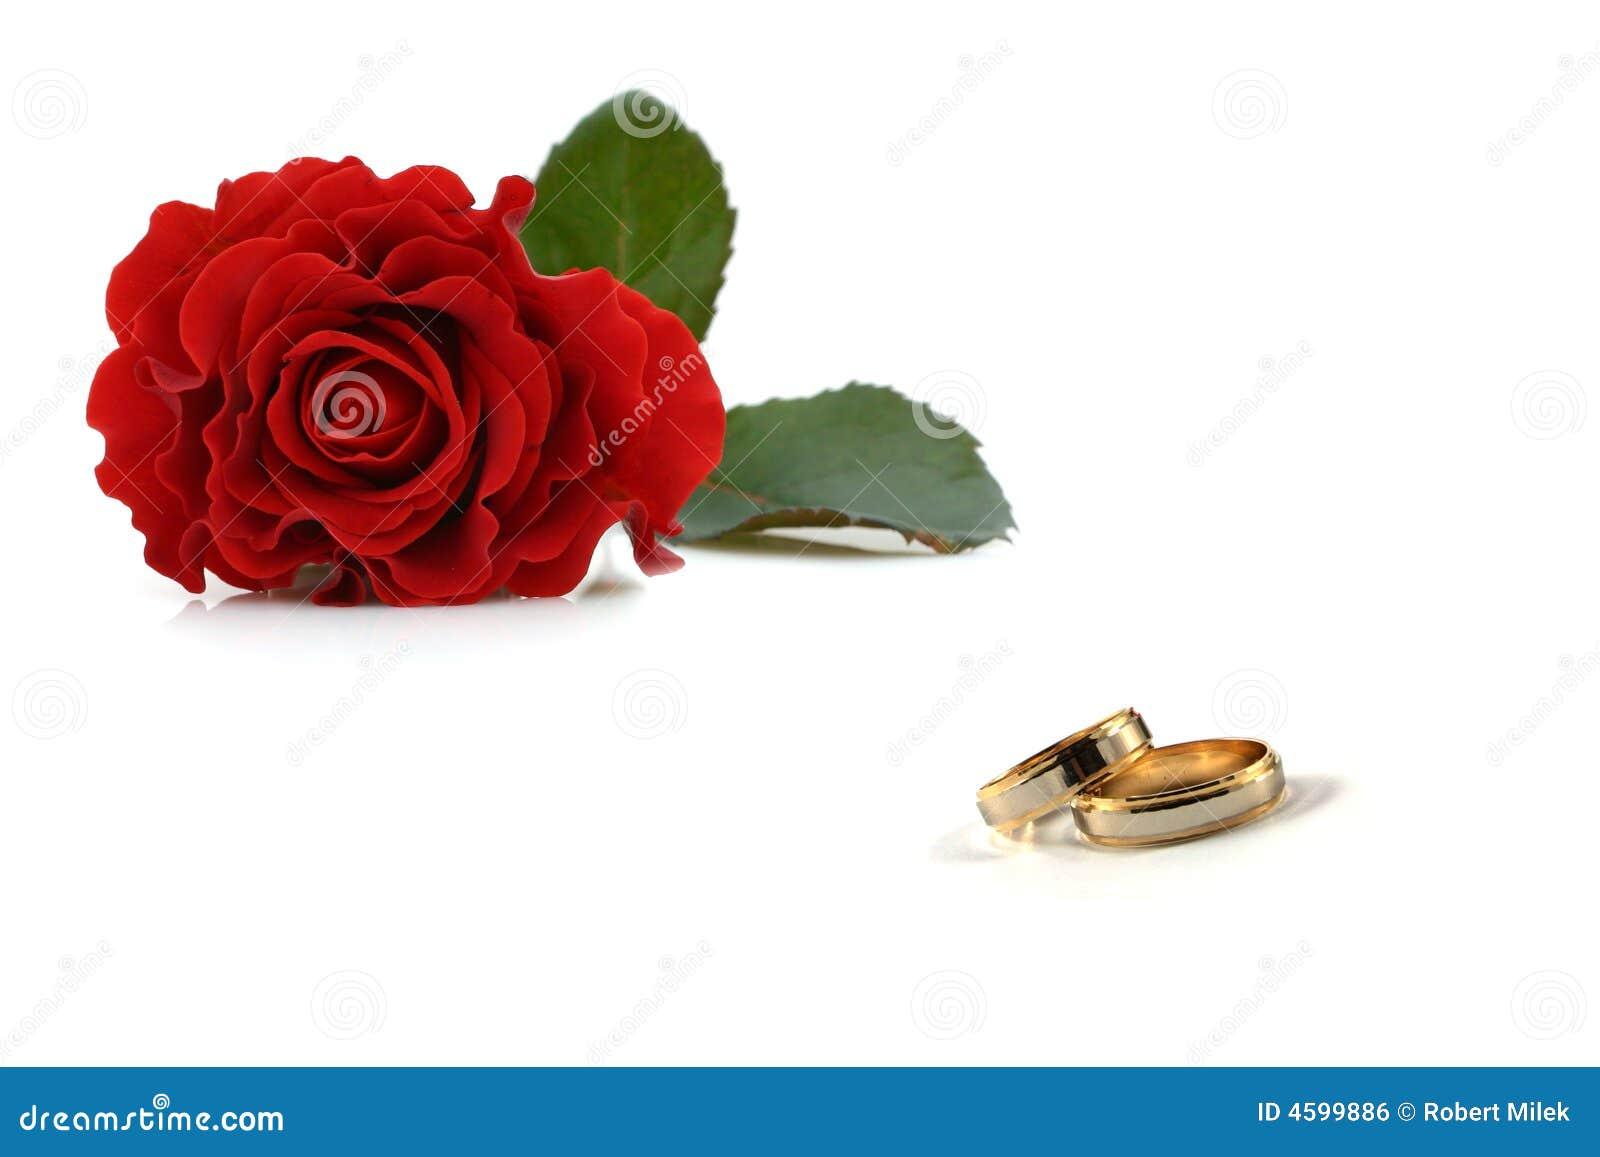 Wedding Rings And Roses Stock Photo Image Of Bridal Band